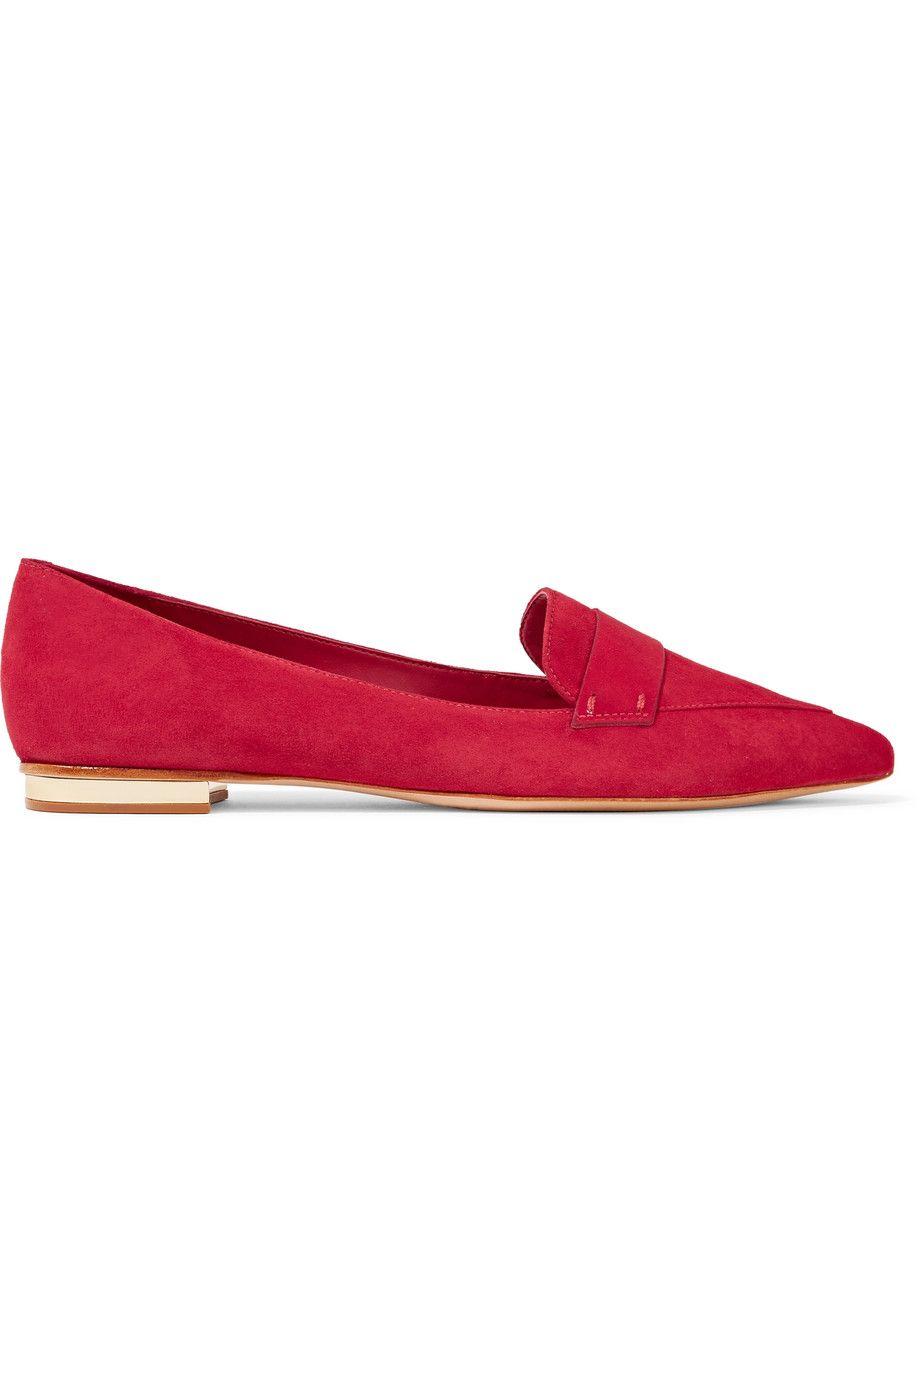 bd801fd70 SCHUTZ Elise Suede Loafers. #schutz #shoes #flats | Schutz